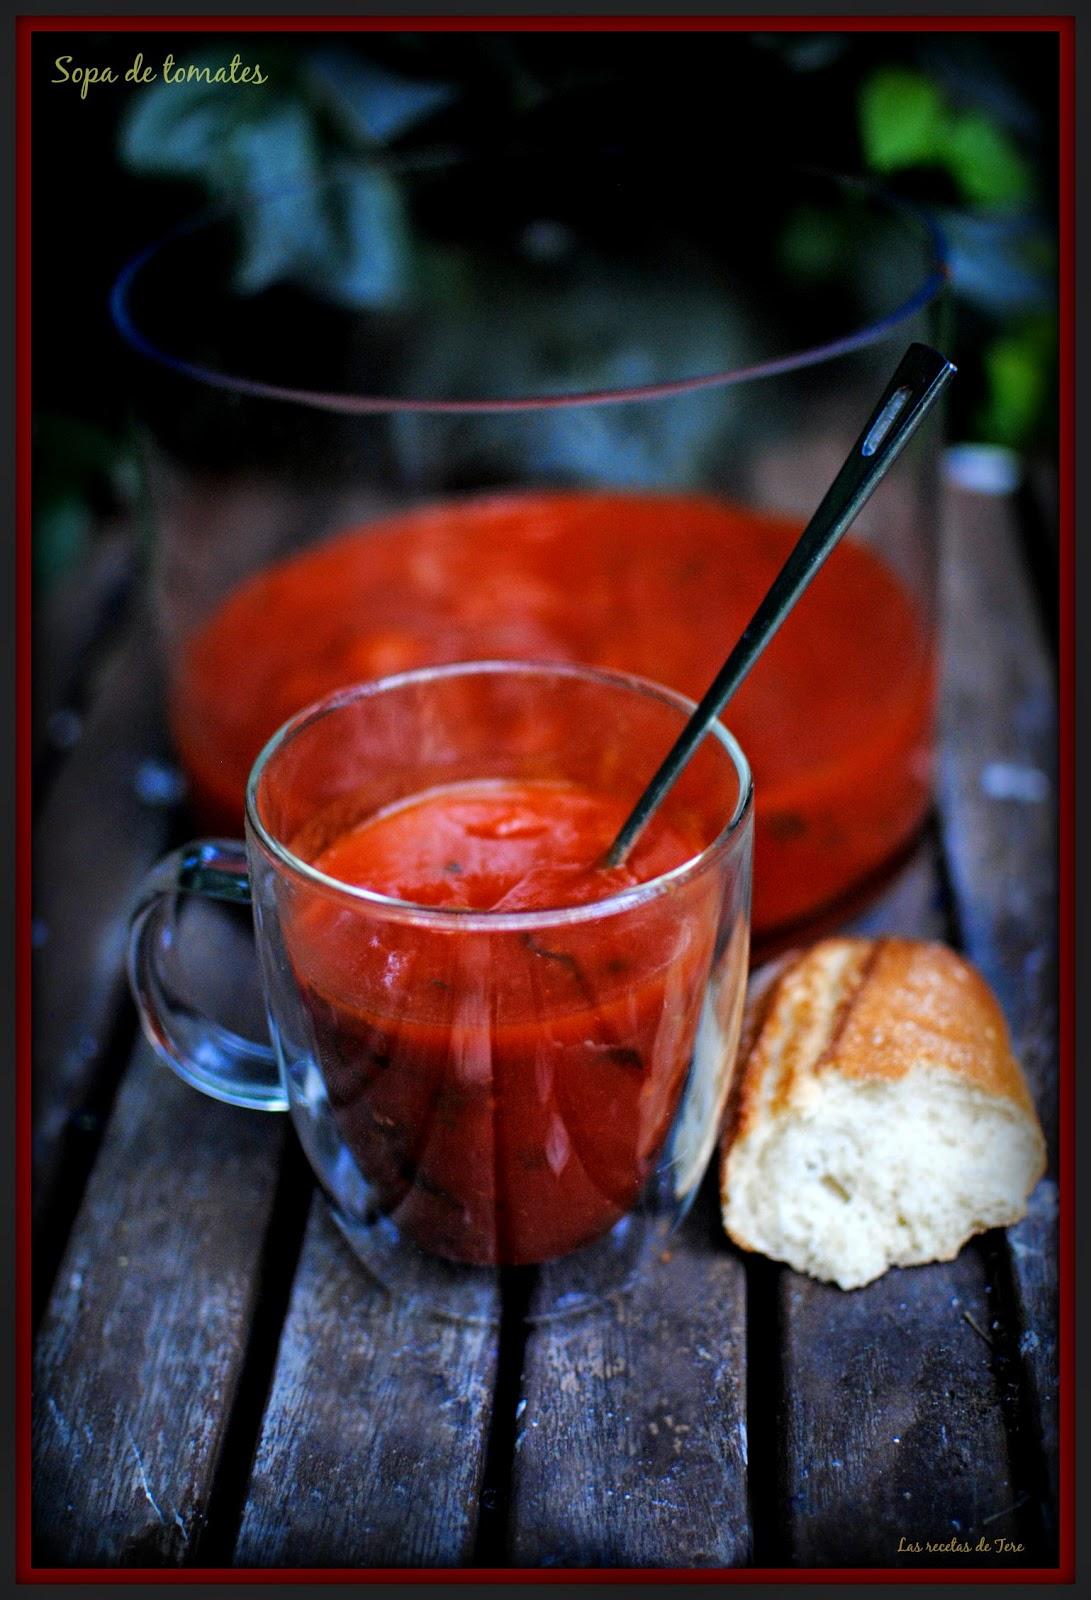 sopa de tomates tererecetas 02